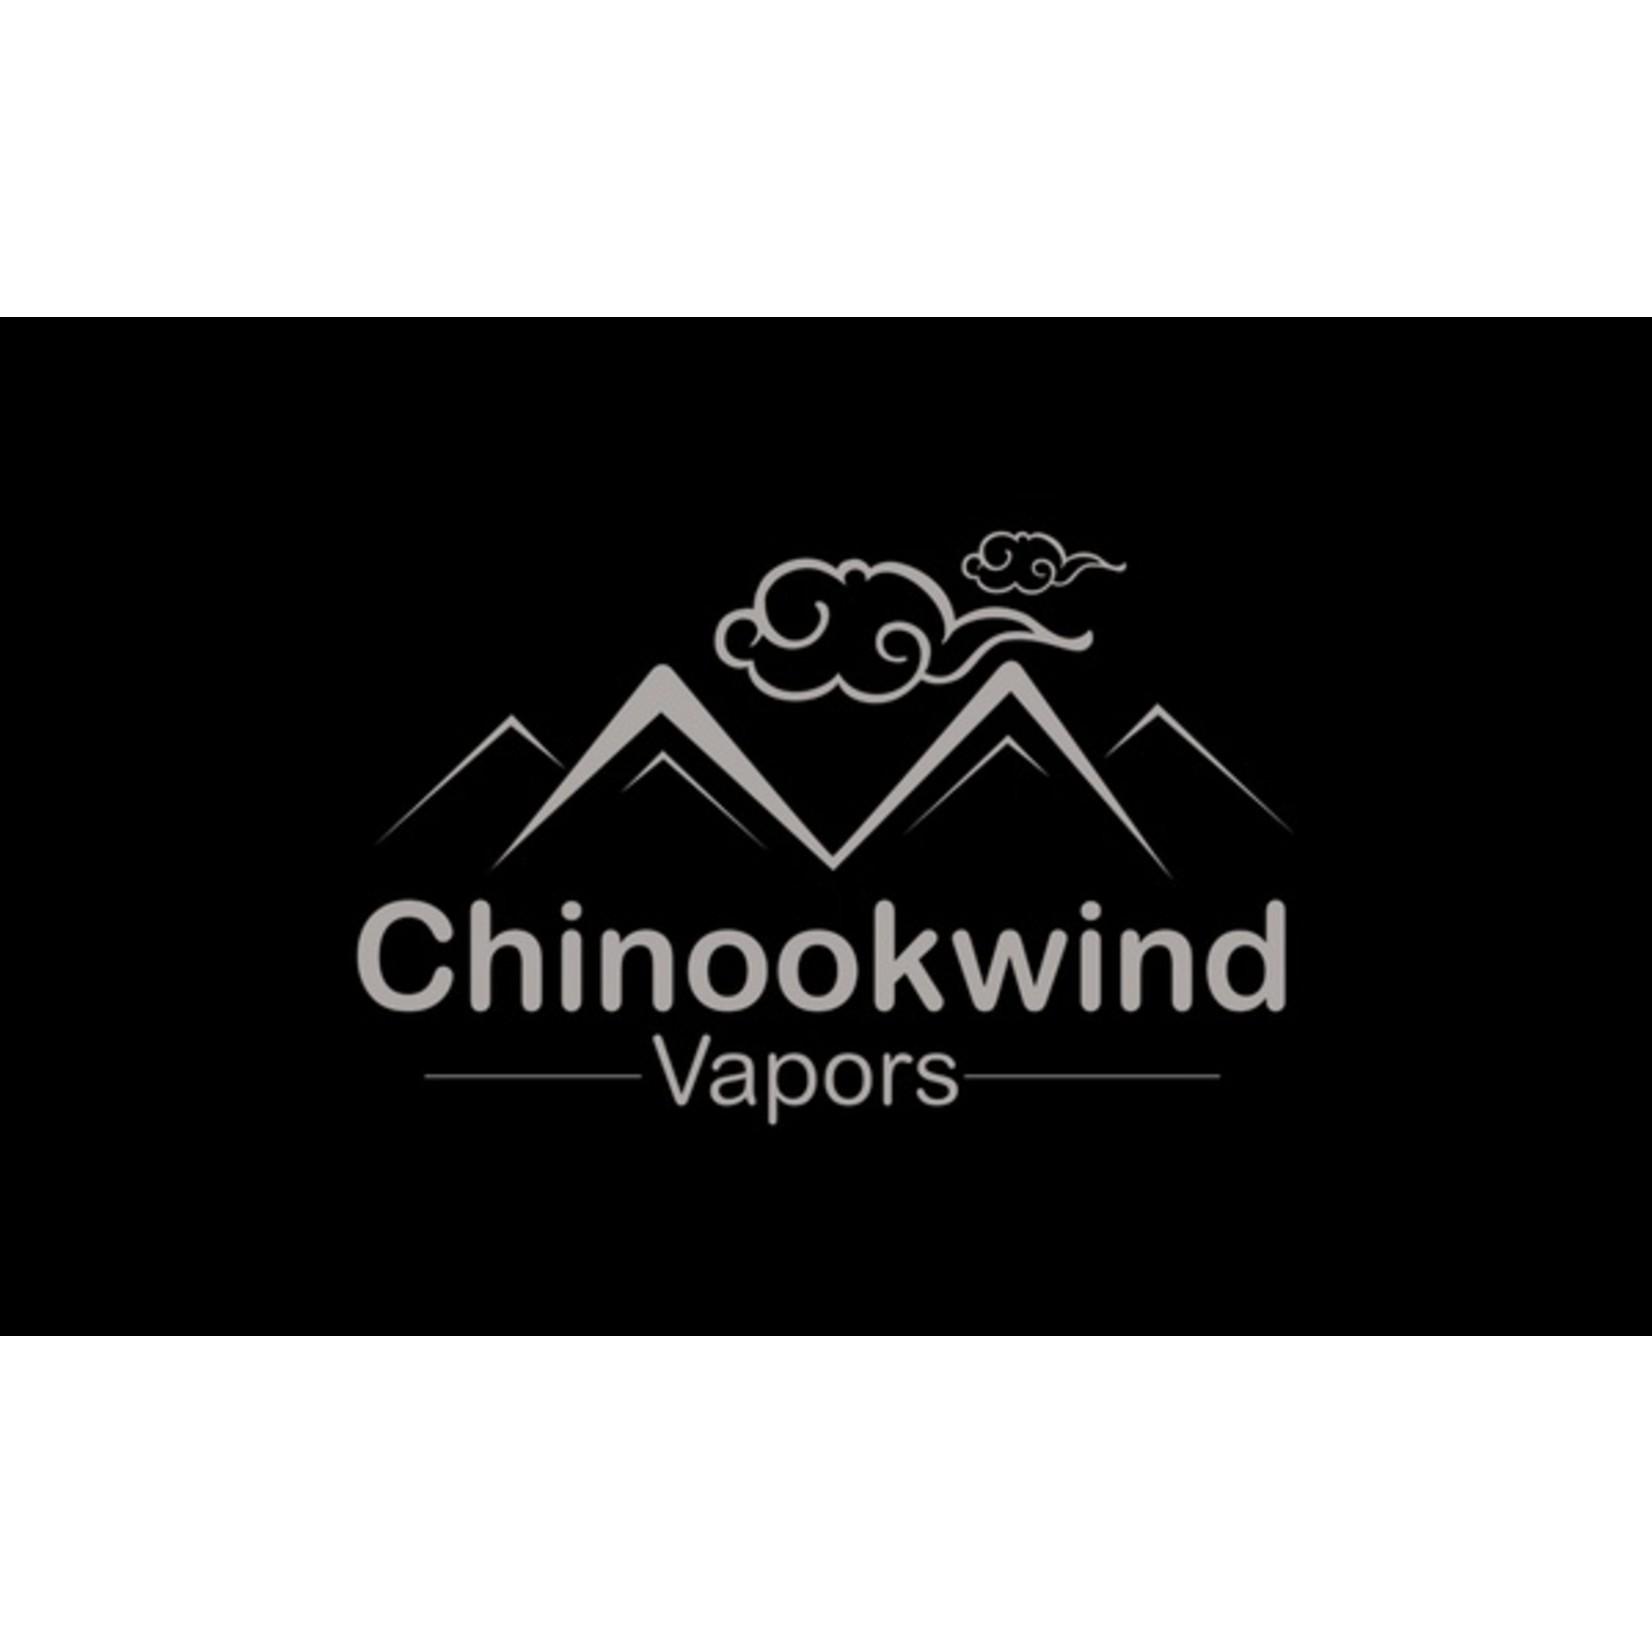 Chinookwind Vapor Ooh Julius